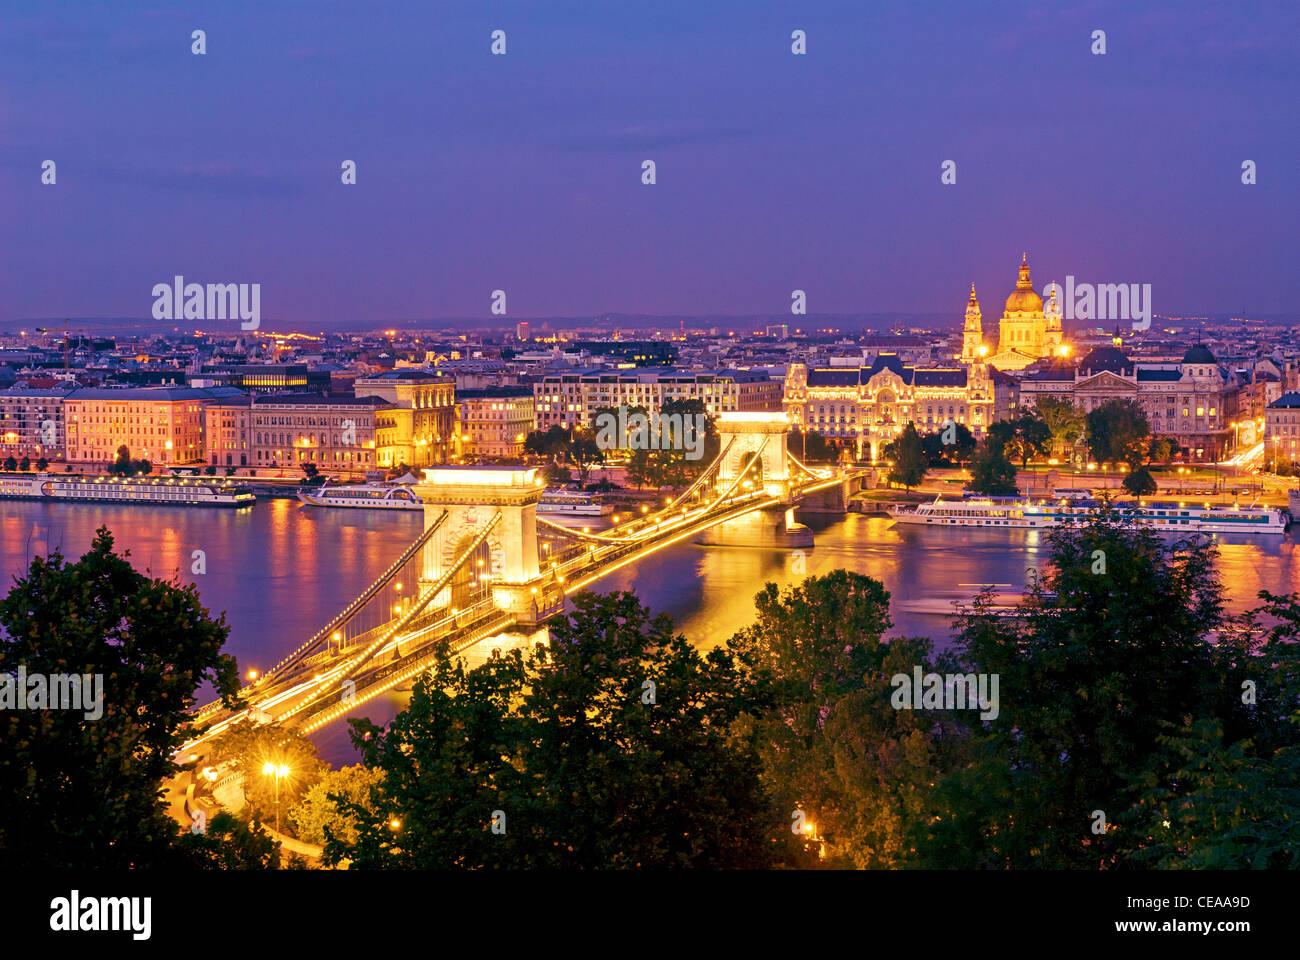 Budapest Danube River Chain Bridge Hungary Dusk - Stock Image